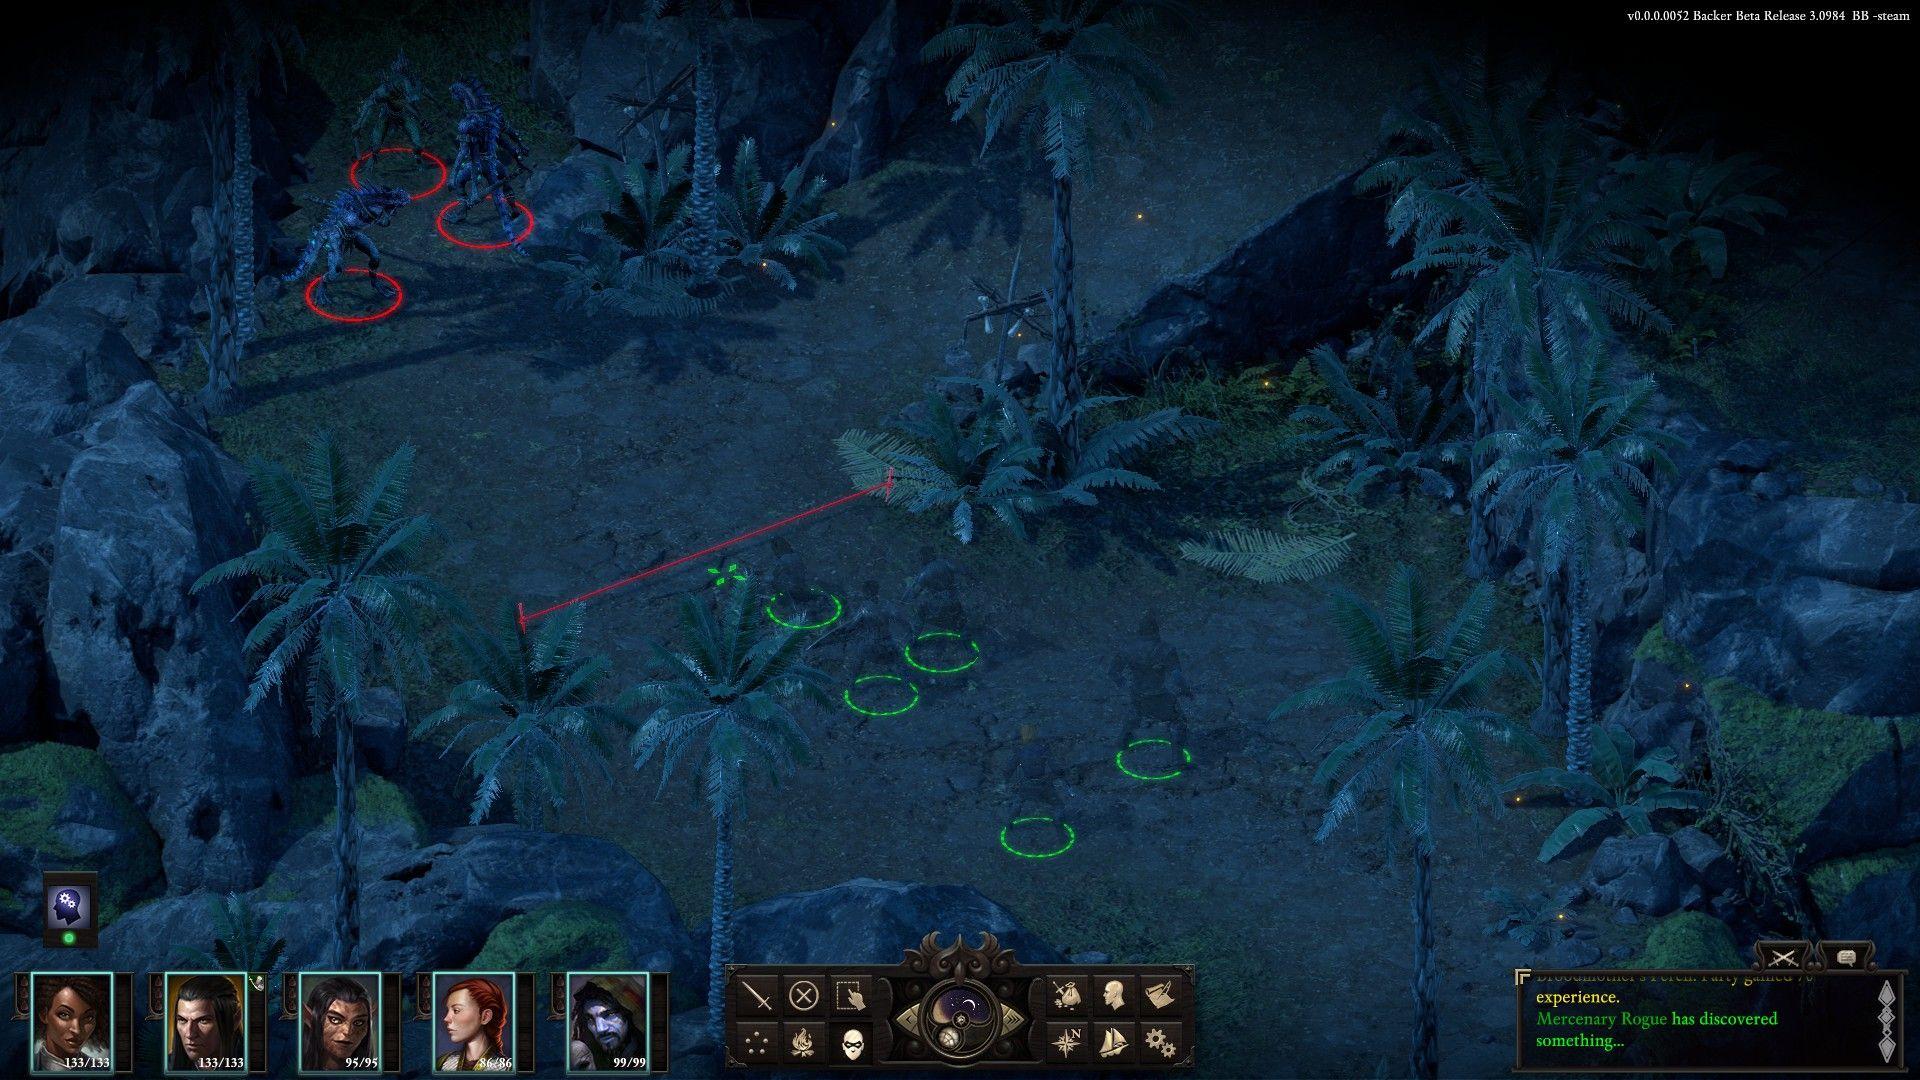 Pillars Of Eternity World Map Complete.Pillars Of Eternity 2 Deadfire Hands On Establishing A Series